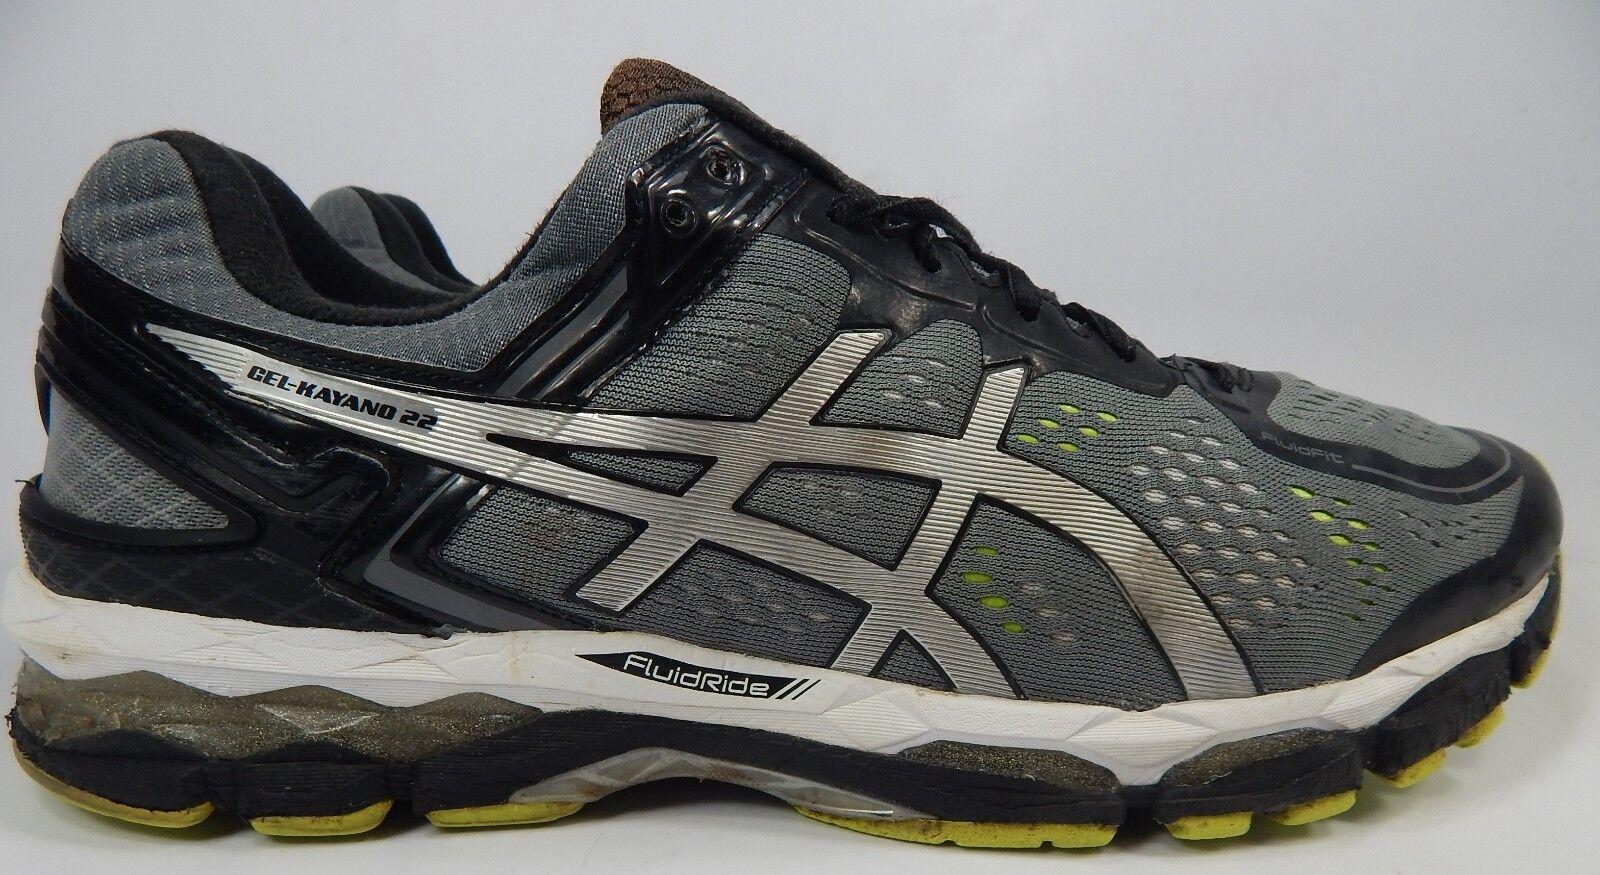 Asics Gel Kayano 22 Size  US 14 M (D) EU 49 Men's Running shoes Silver T547N